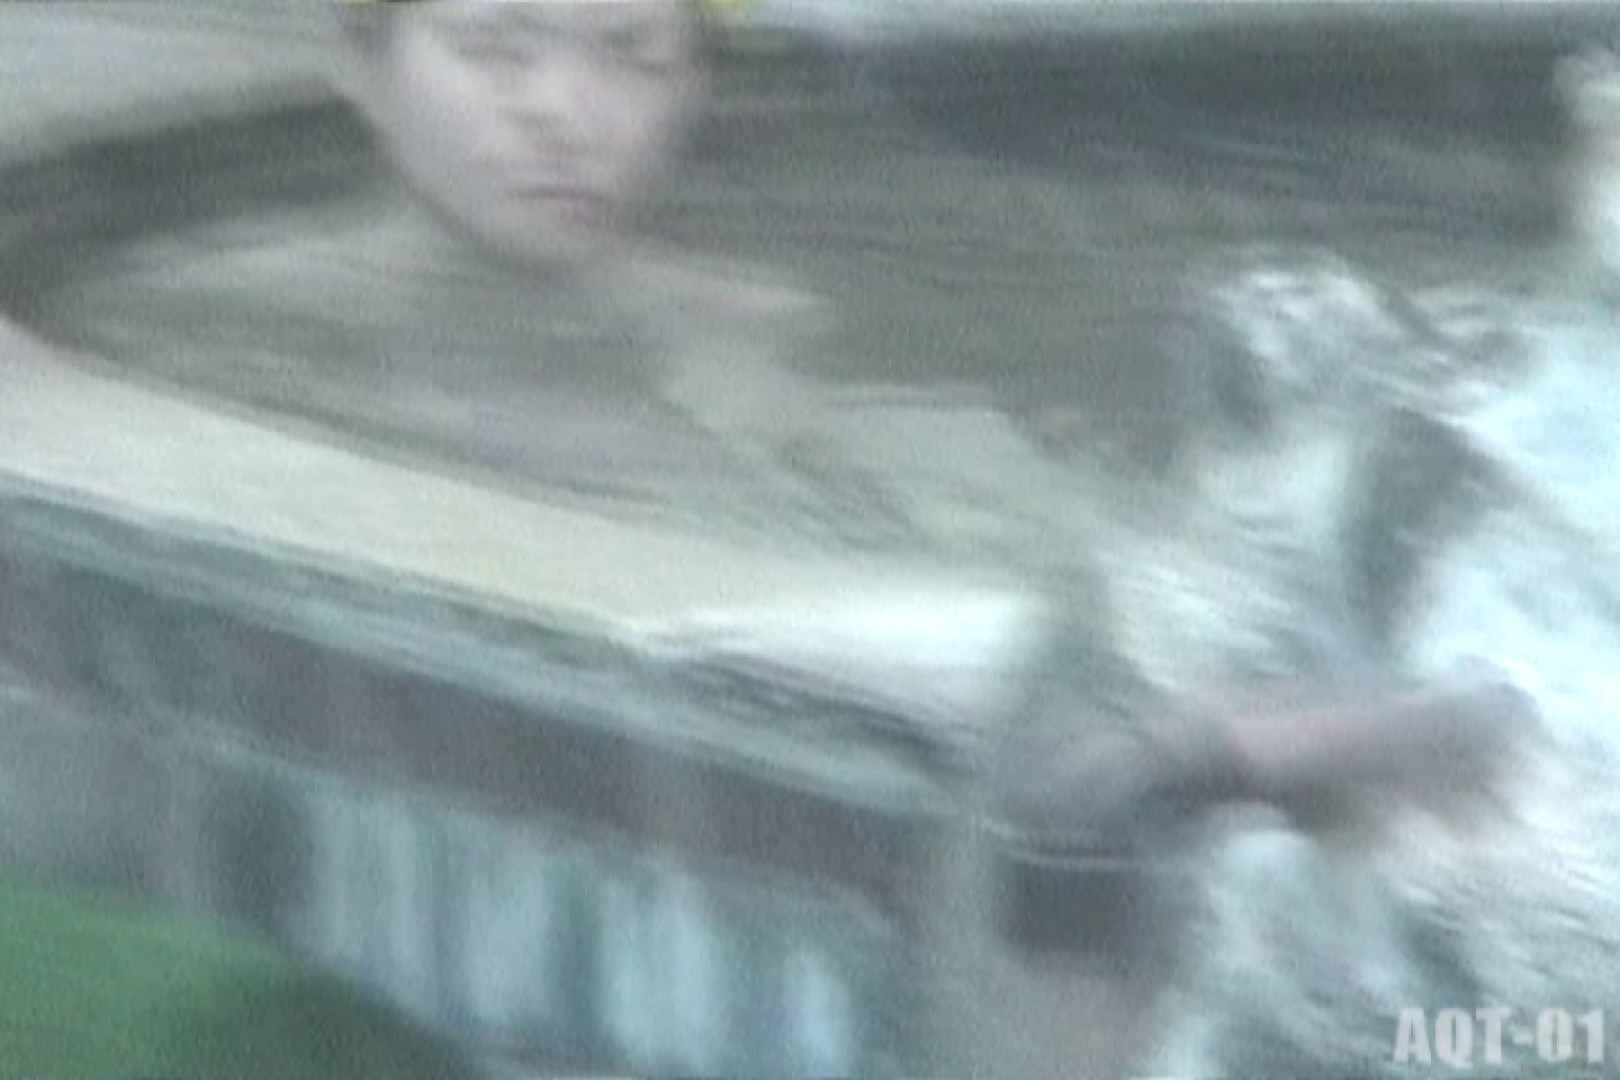 Aquaな露天風呂Vol.720 盗撮大放出 SEX無修正画像 95連発 23